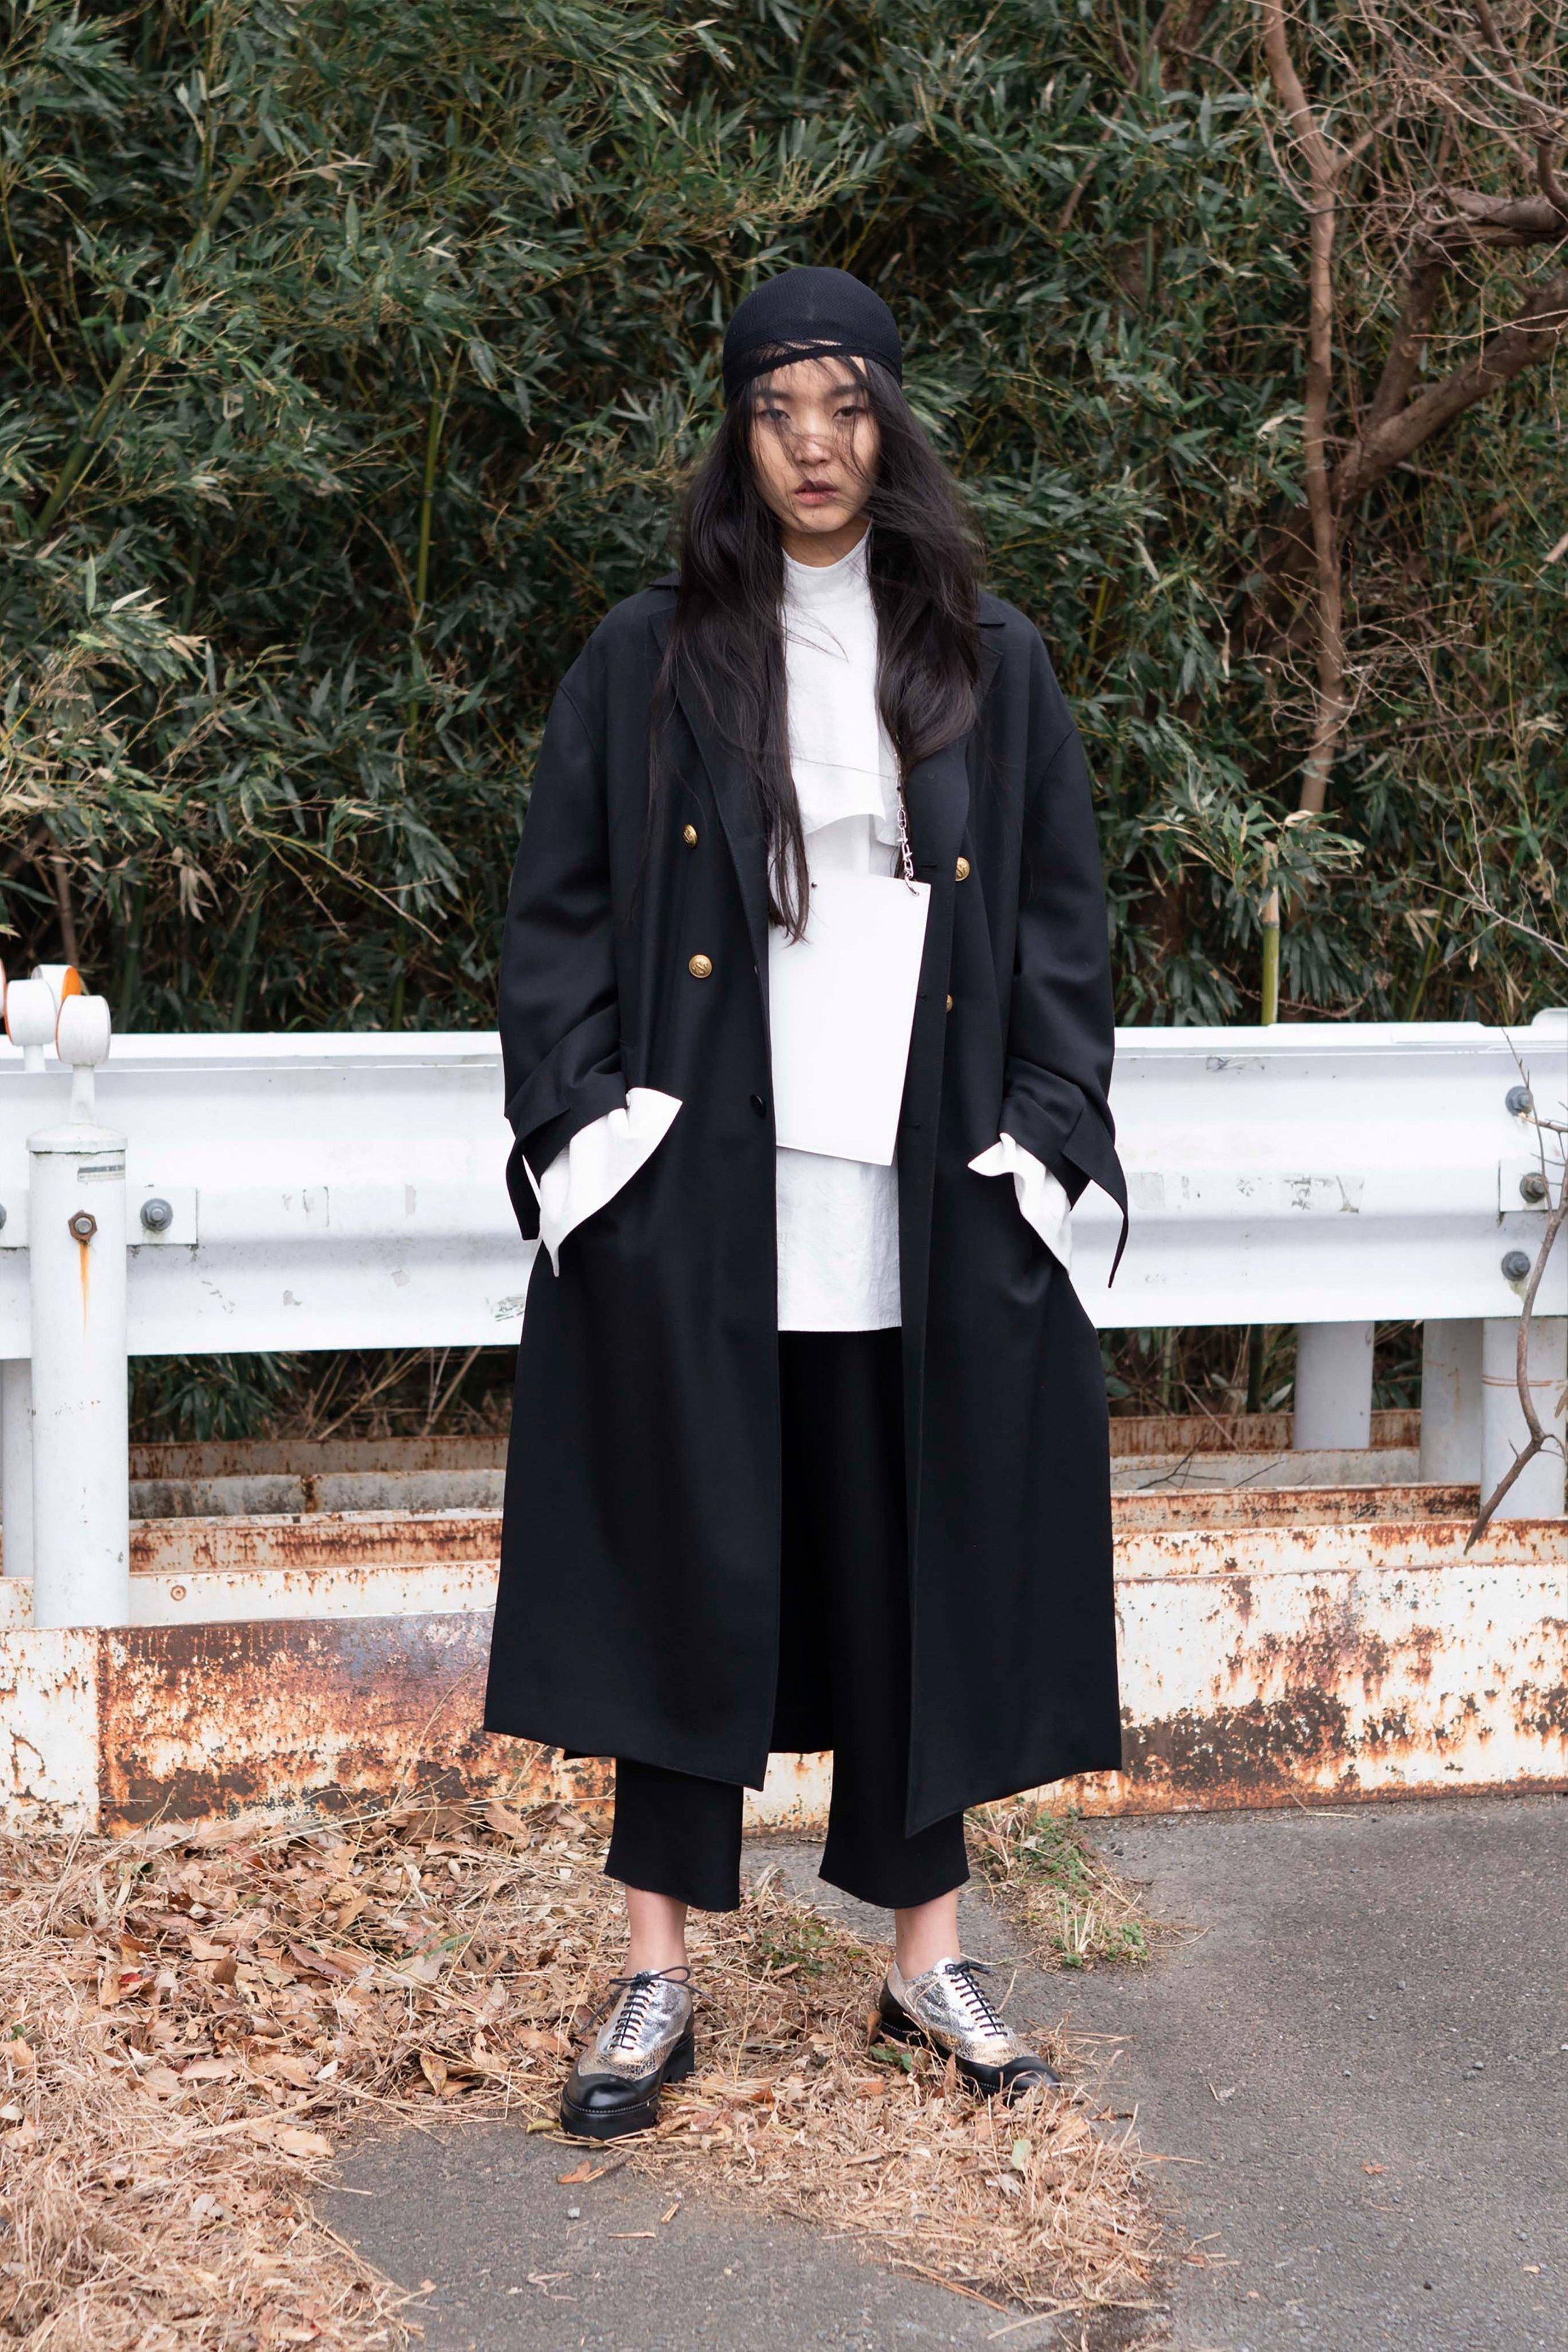 00044-Ys-Yohji-Yamamoto-FALL-19-Ready-To-Wear.jpg